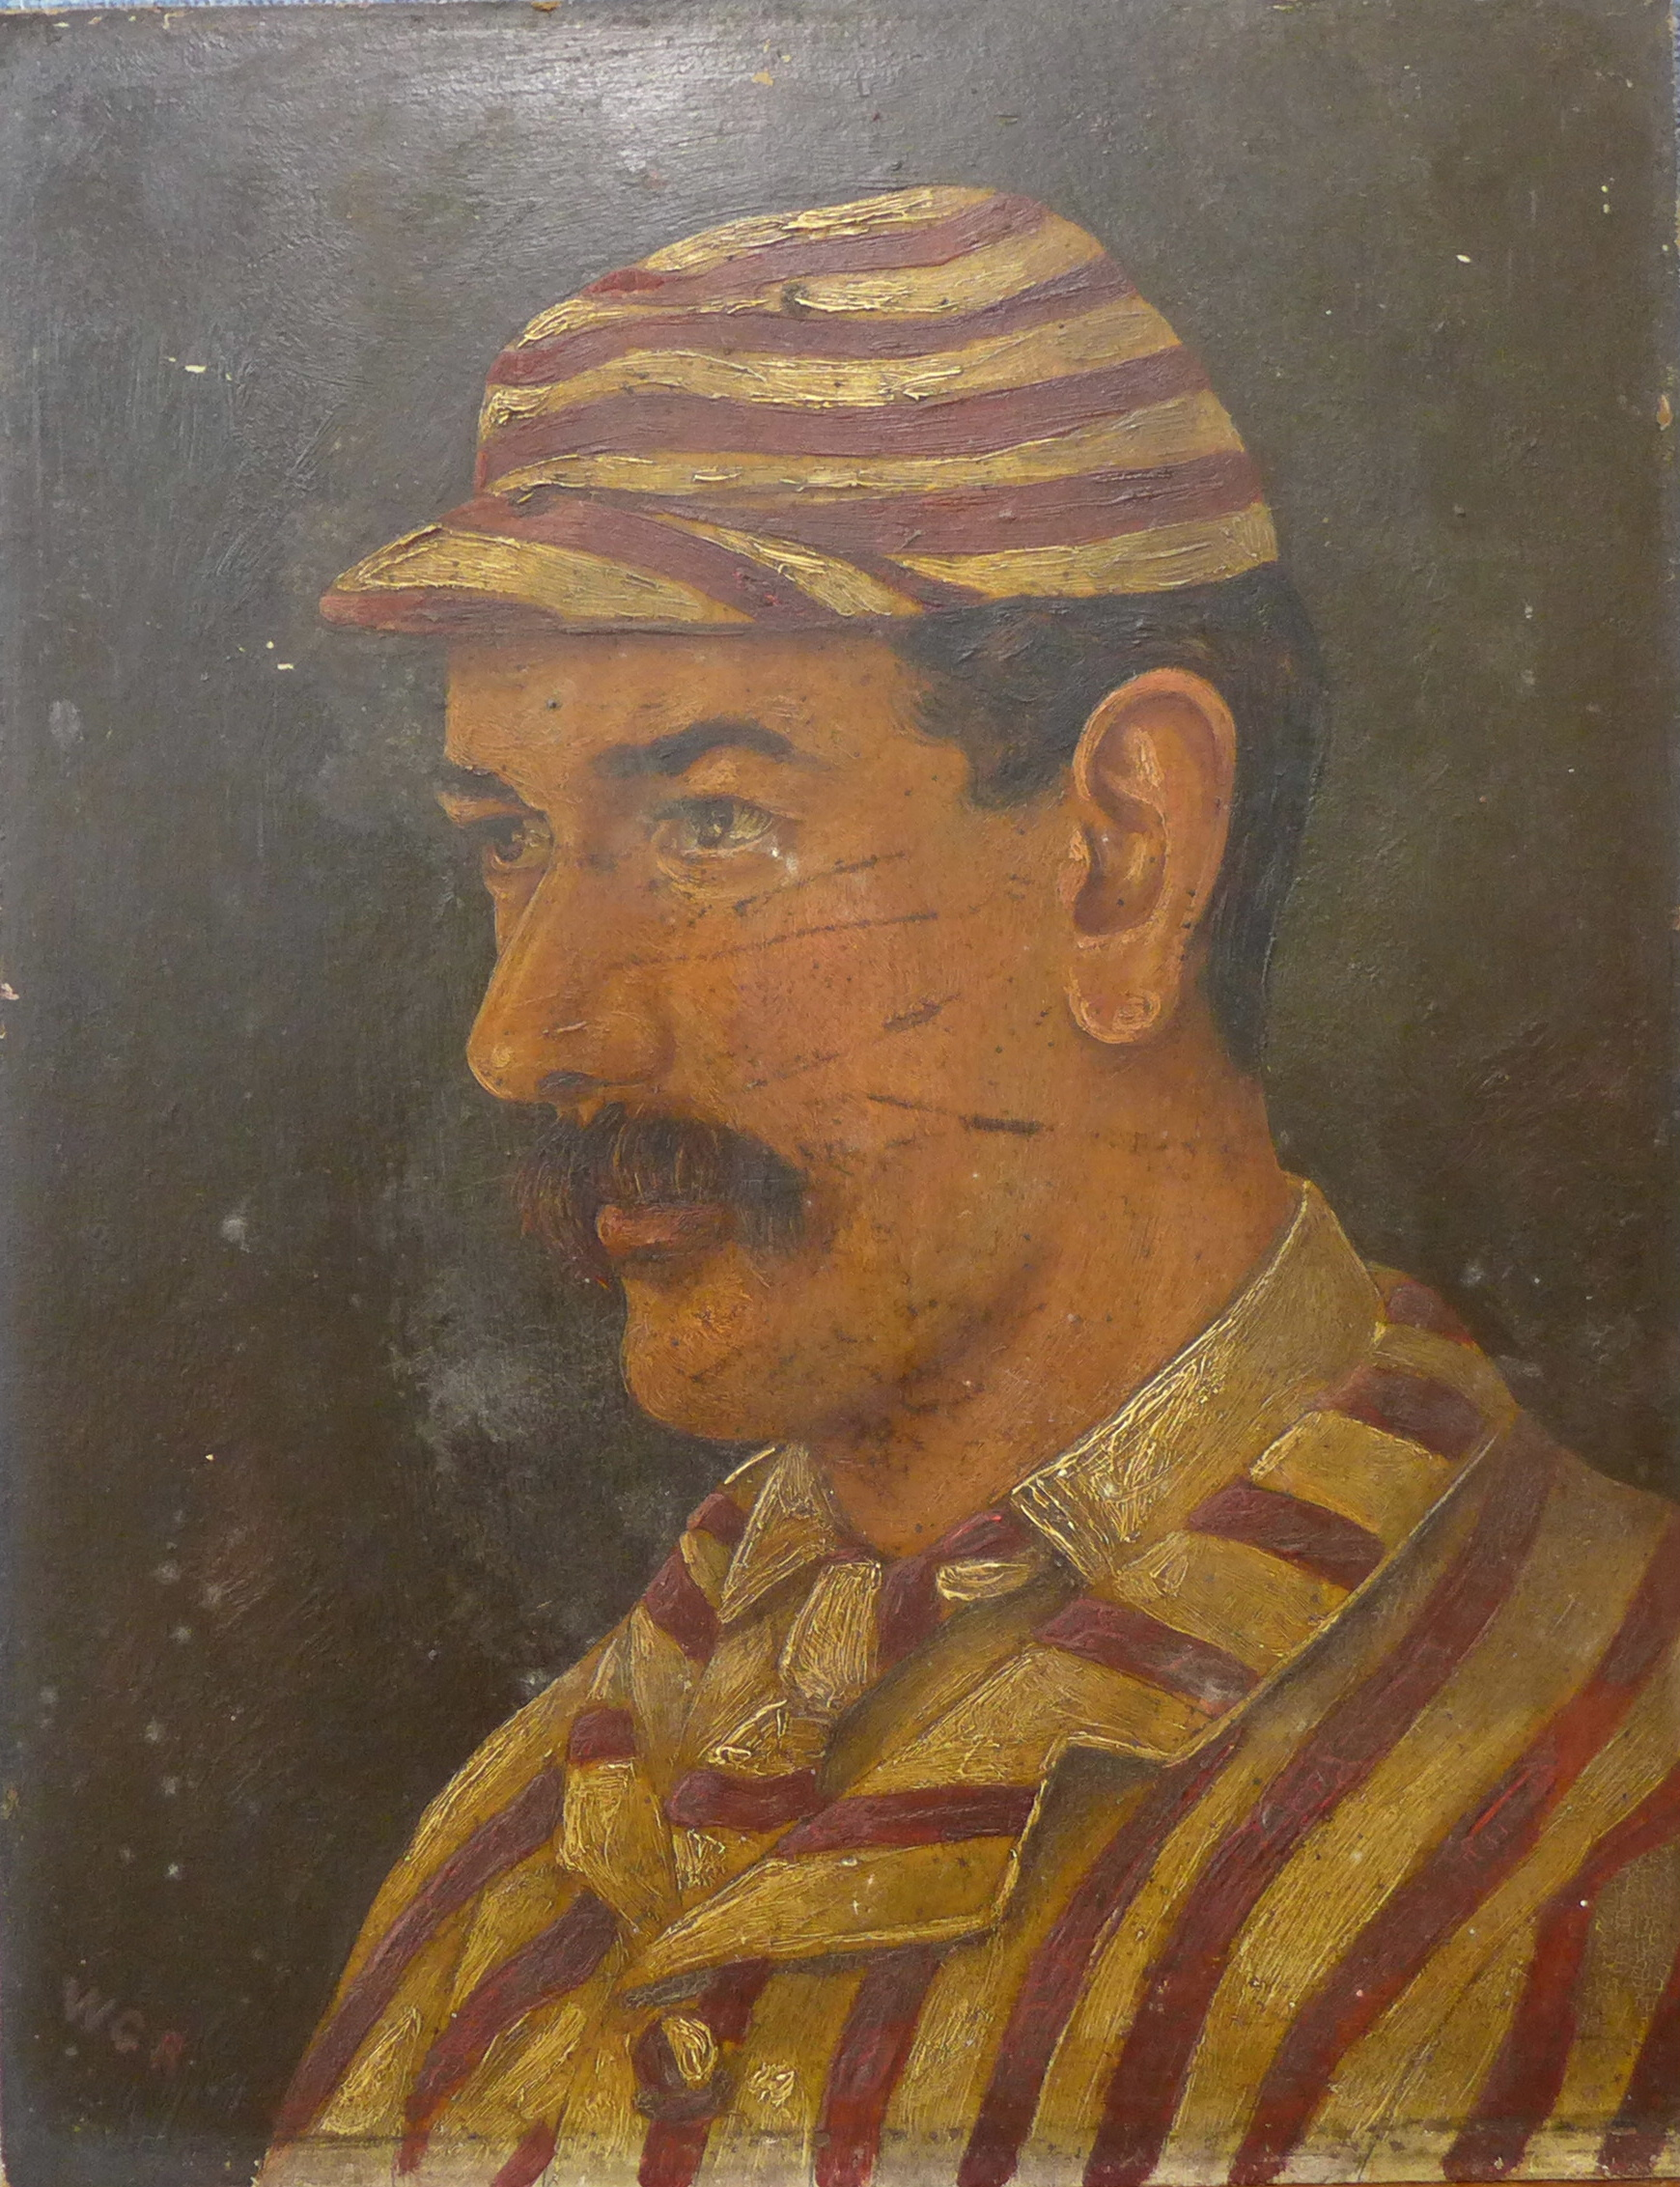 Lot 3 - English School (19th Century), half portrait of a cricketer, oil on board, 33 x 26cms,